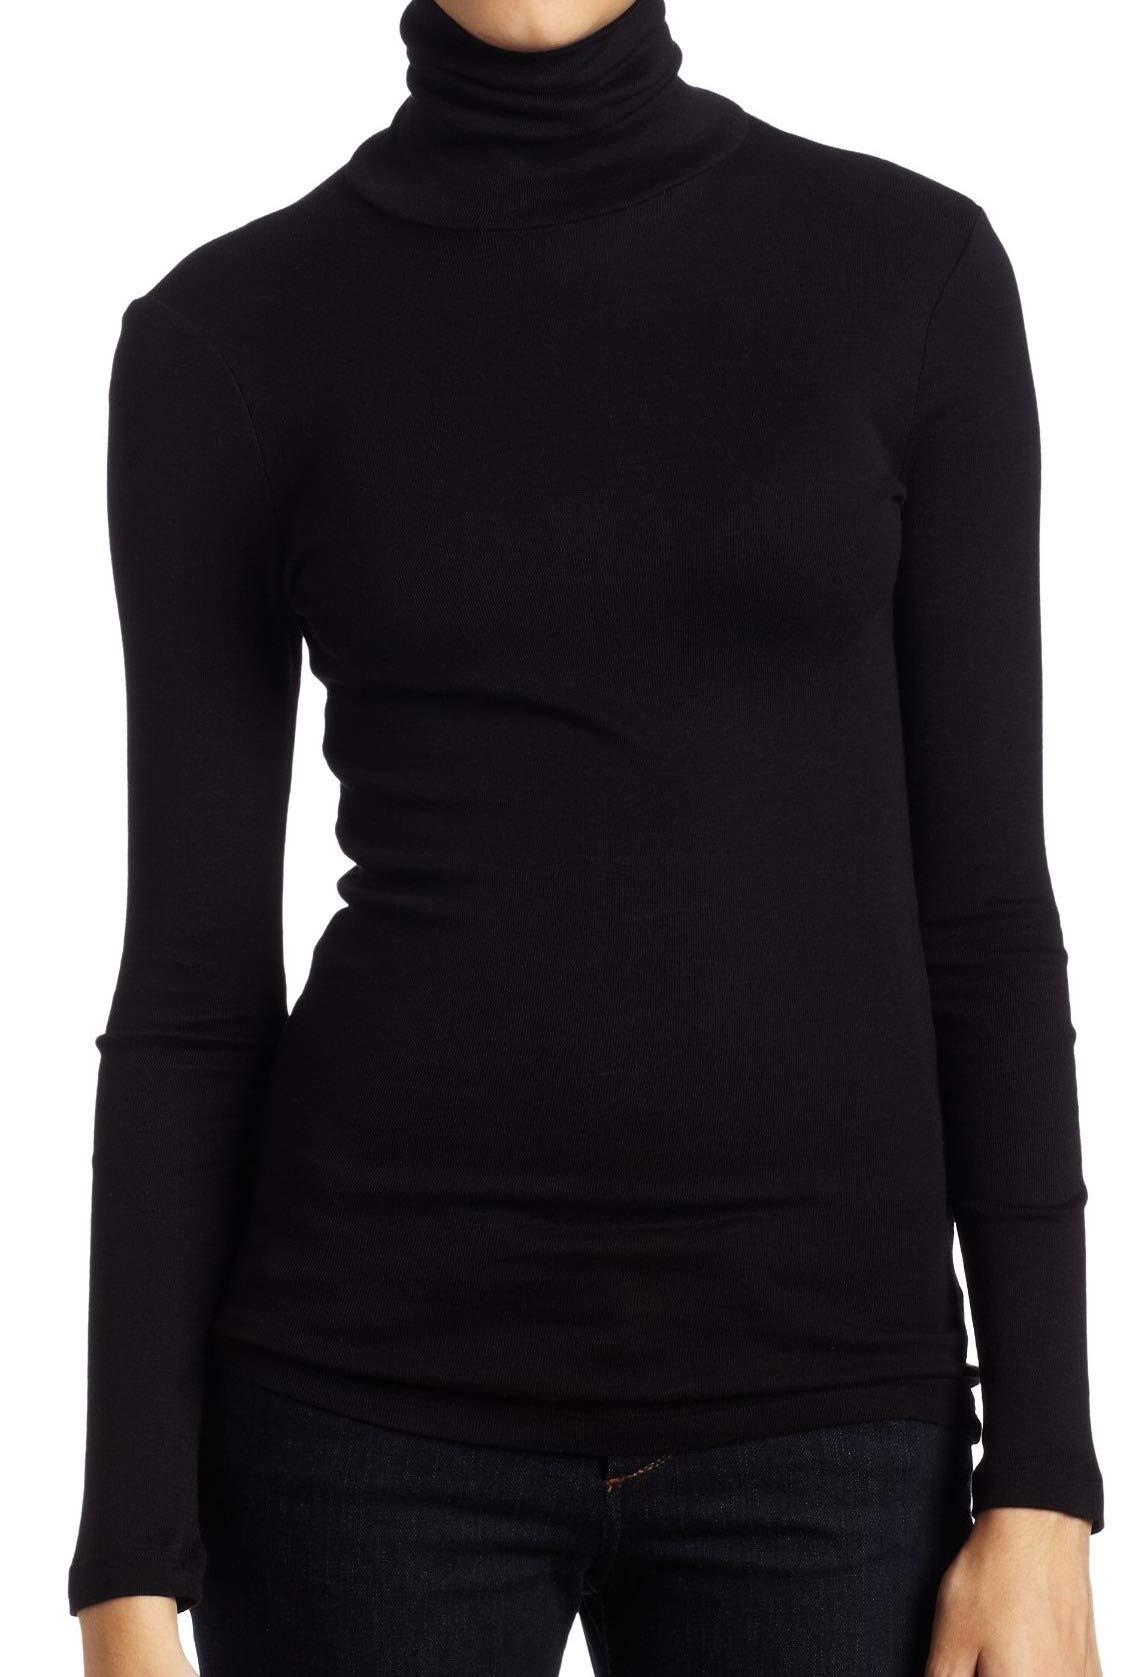 Splendid 1×1 Rib Long Sleeve Turtleneck Tee T-Shirt